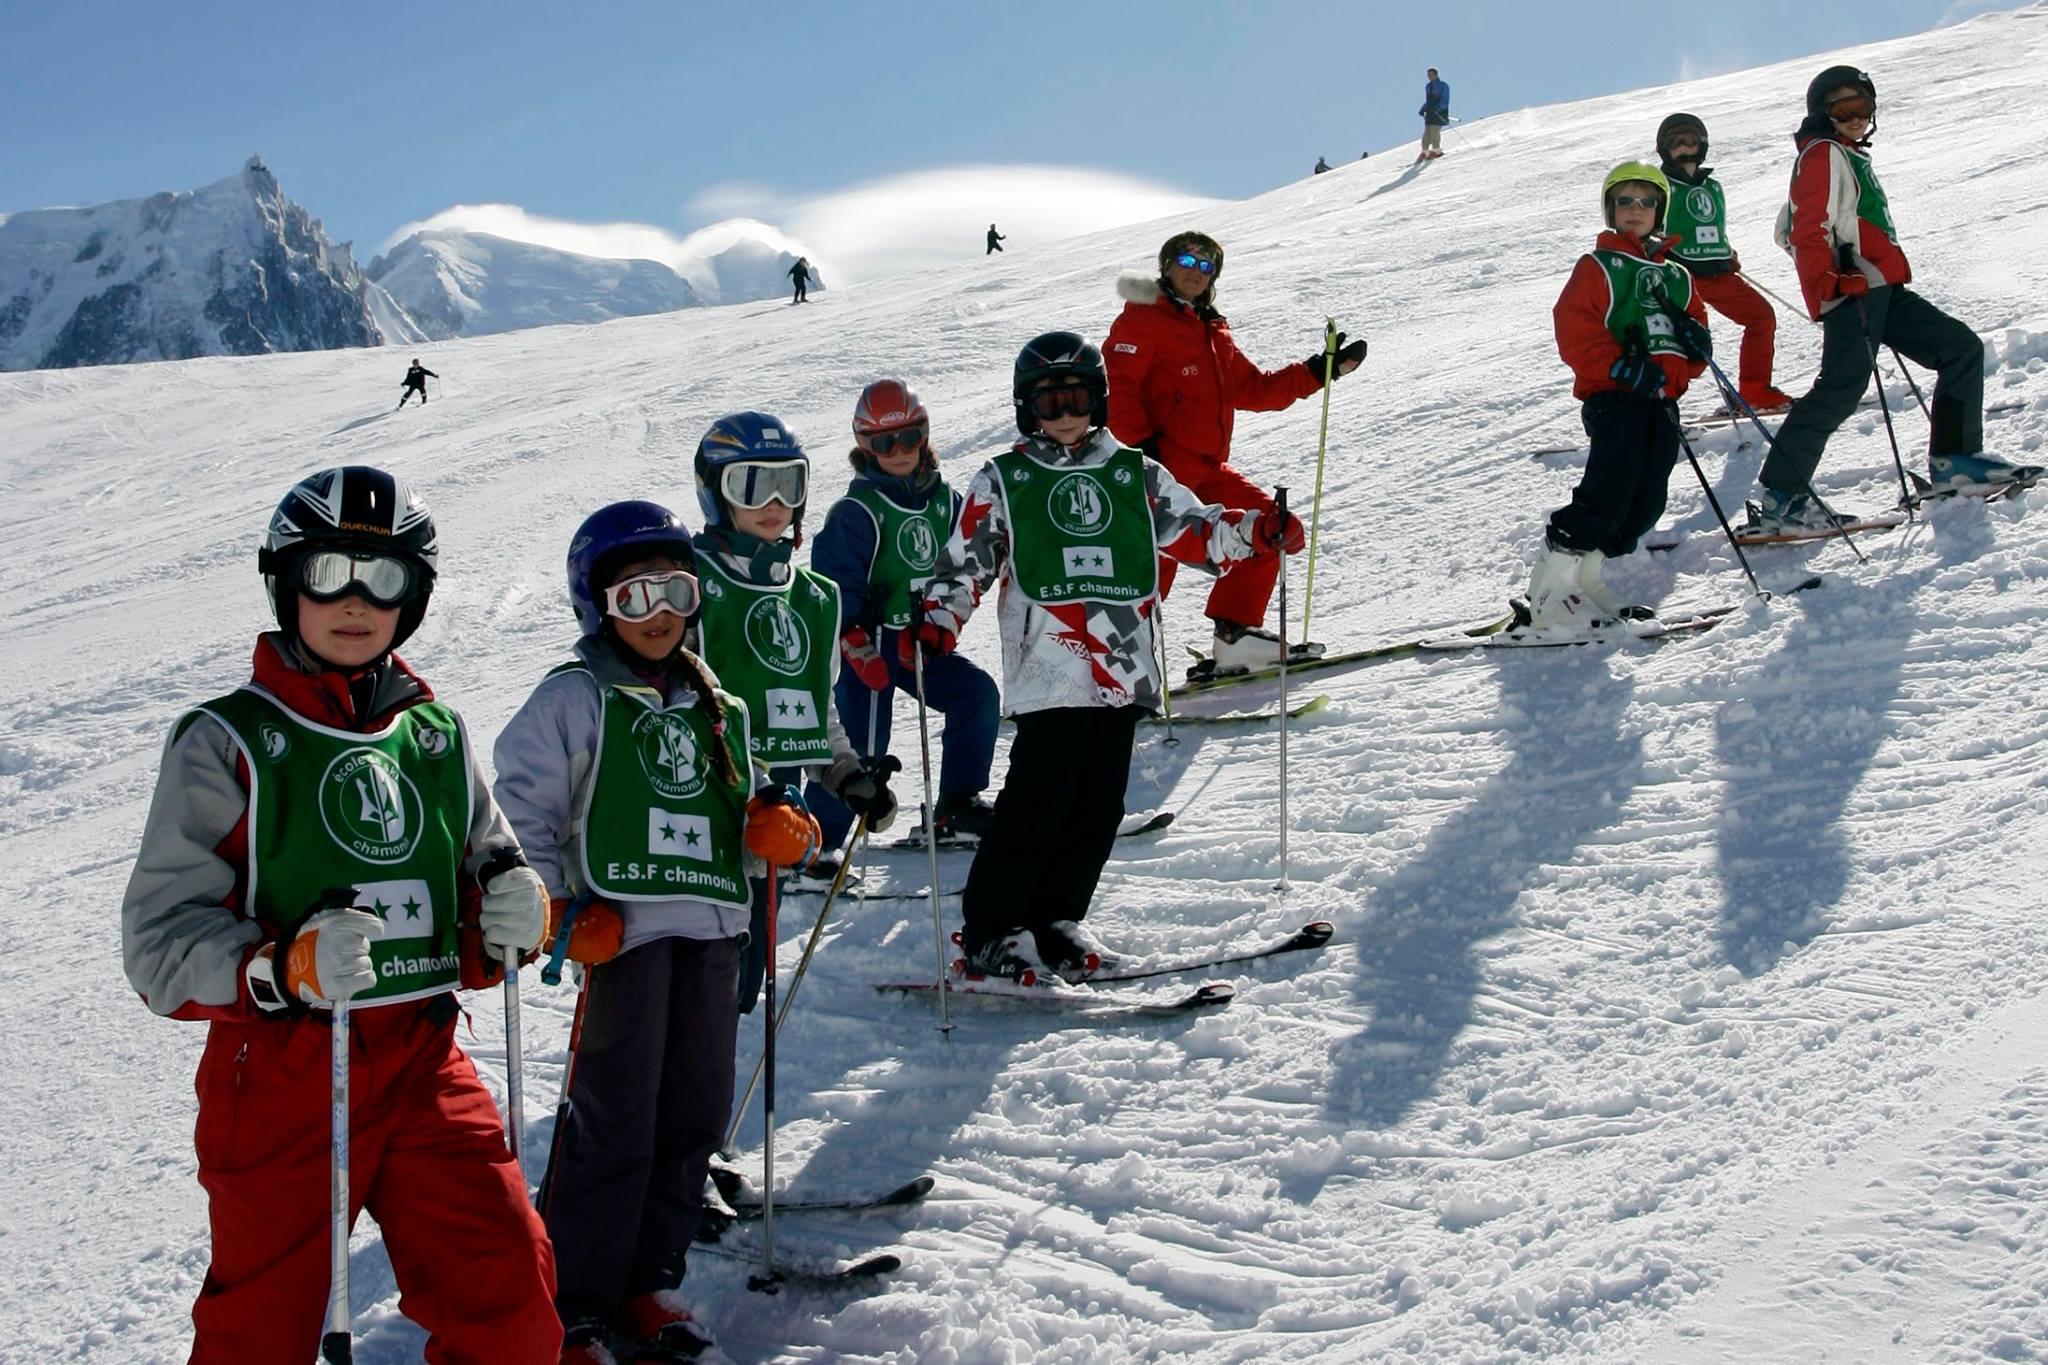 kids-ski-lessons-ski-star-8-12-years-holiday-esf-chamonix-hero